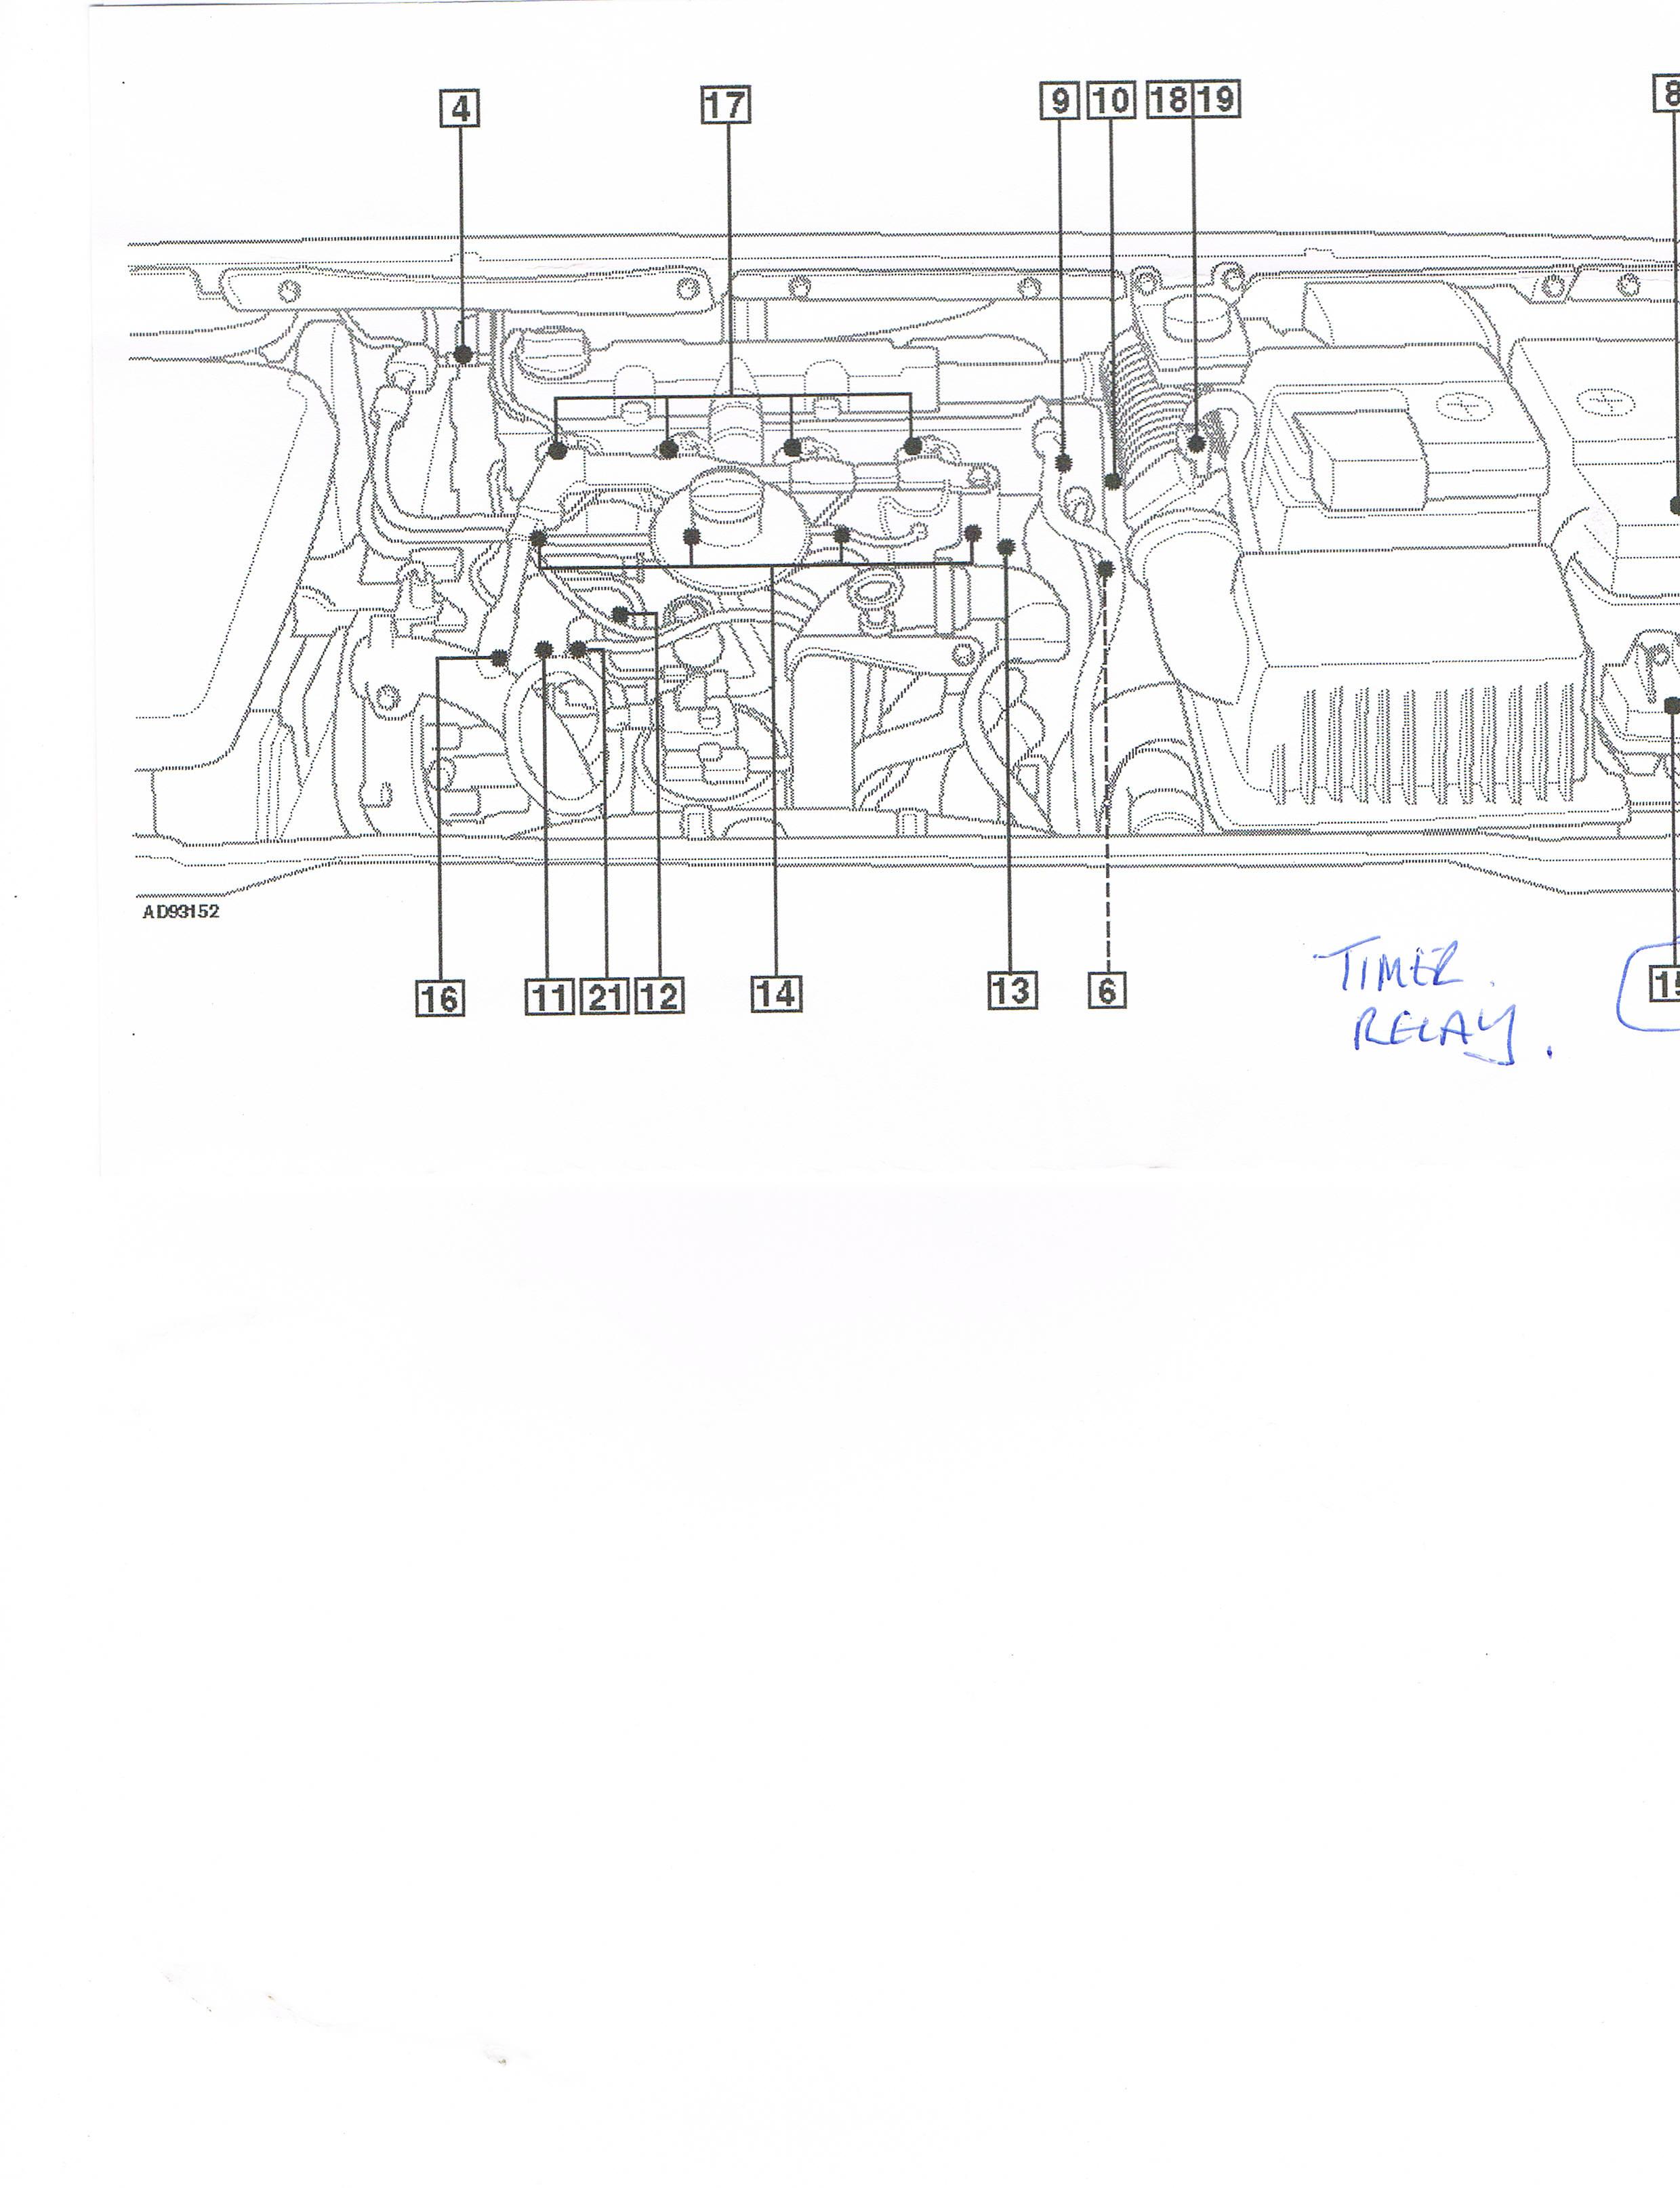 citroen berlingo 2010 wiring diagram  | 399 x 316